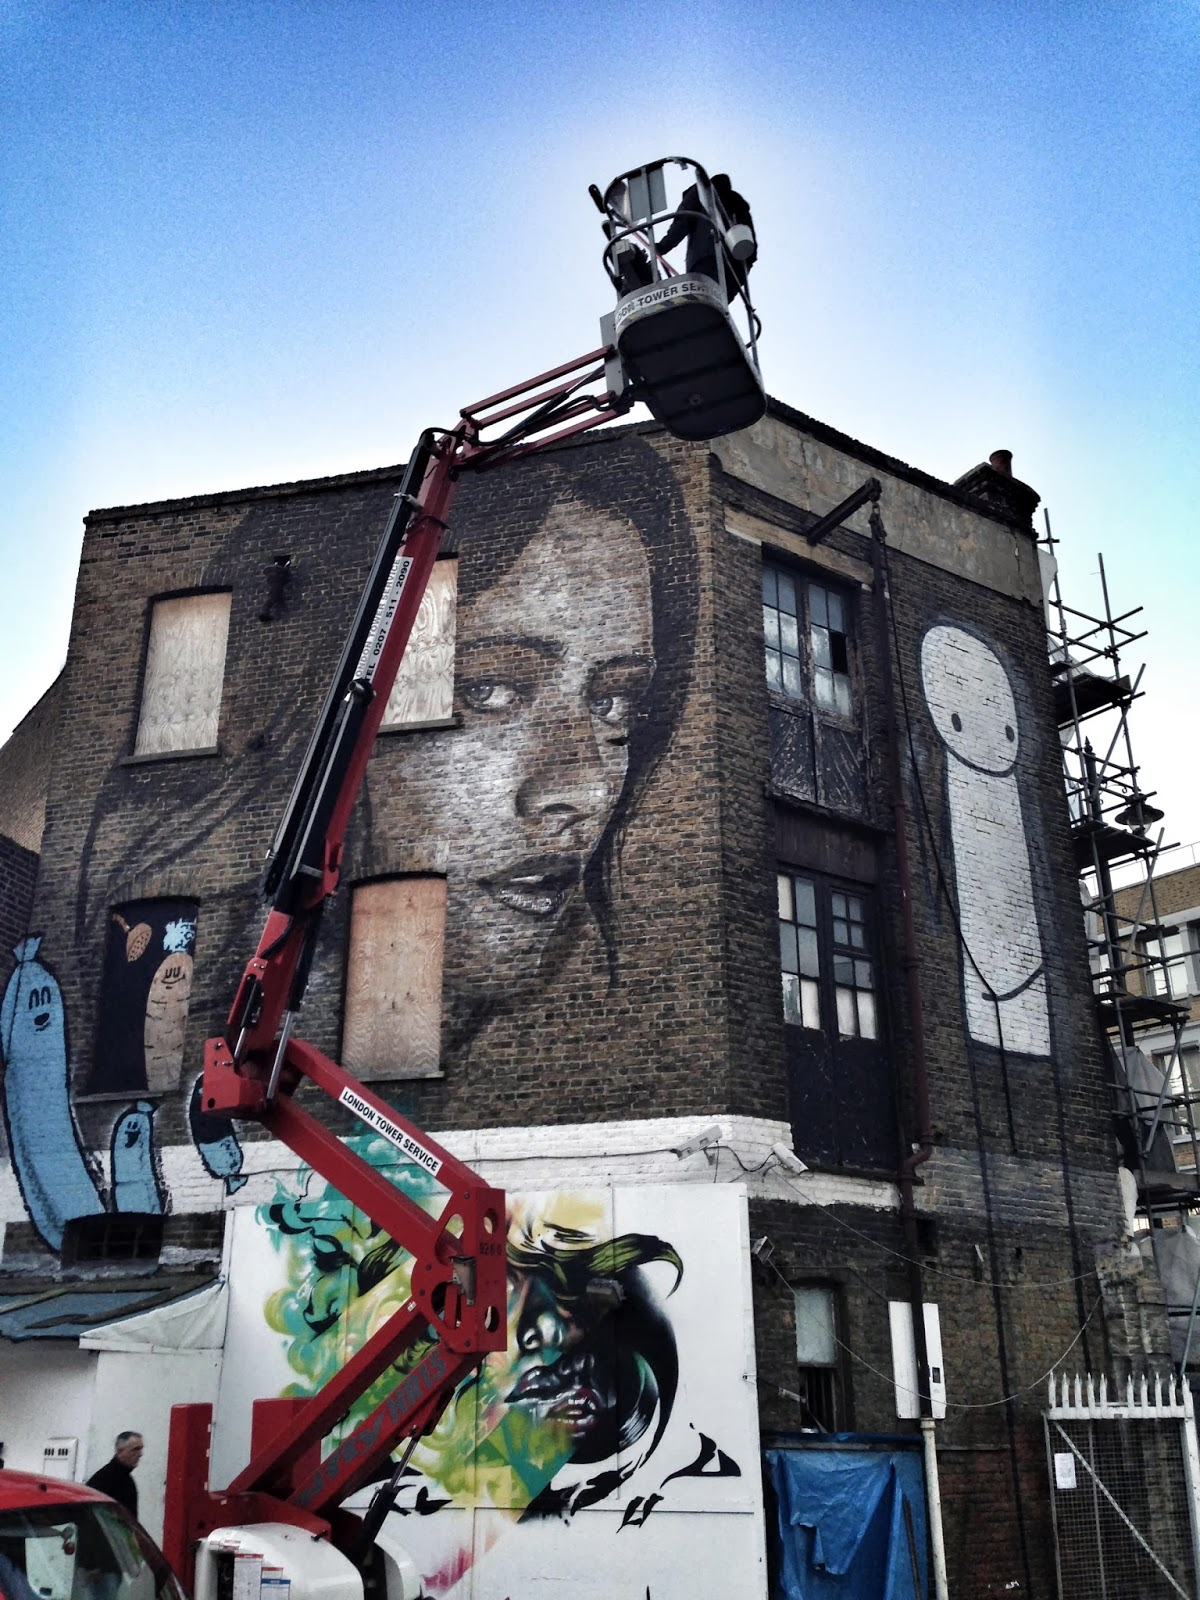 streetartnews_rone_london_uk-8